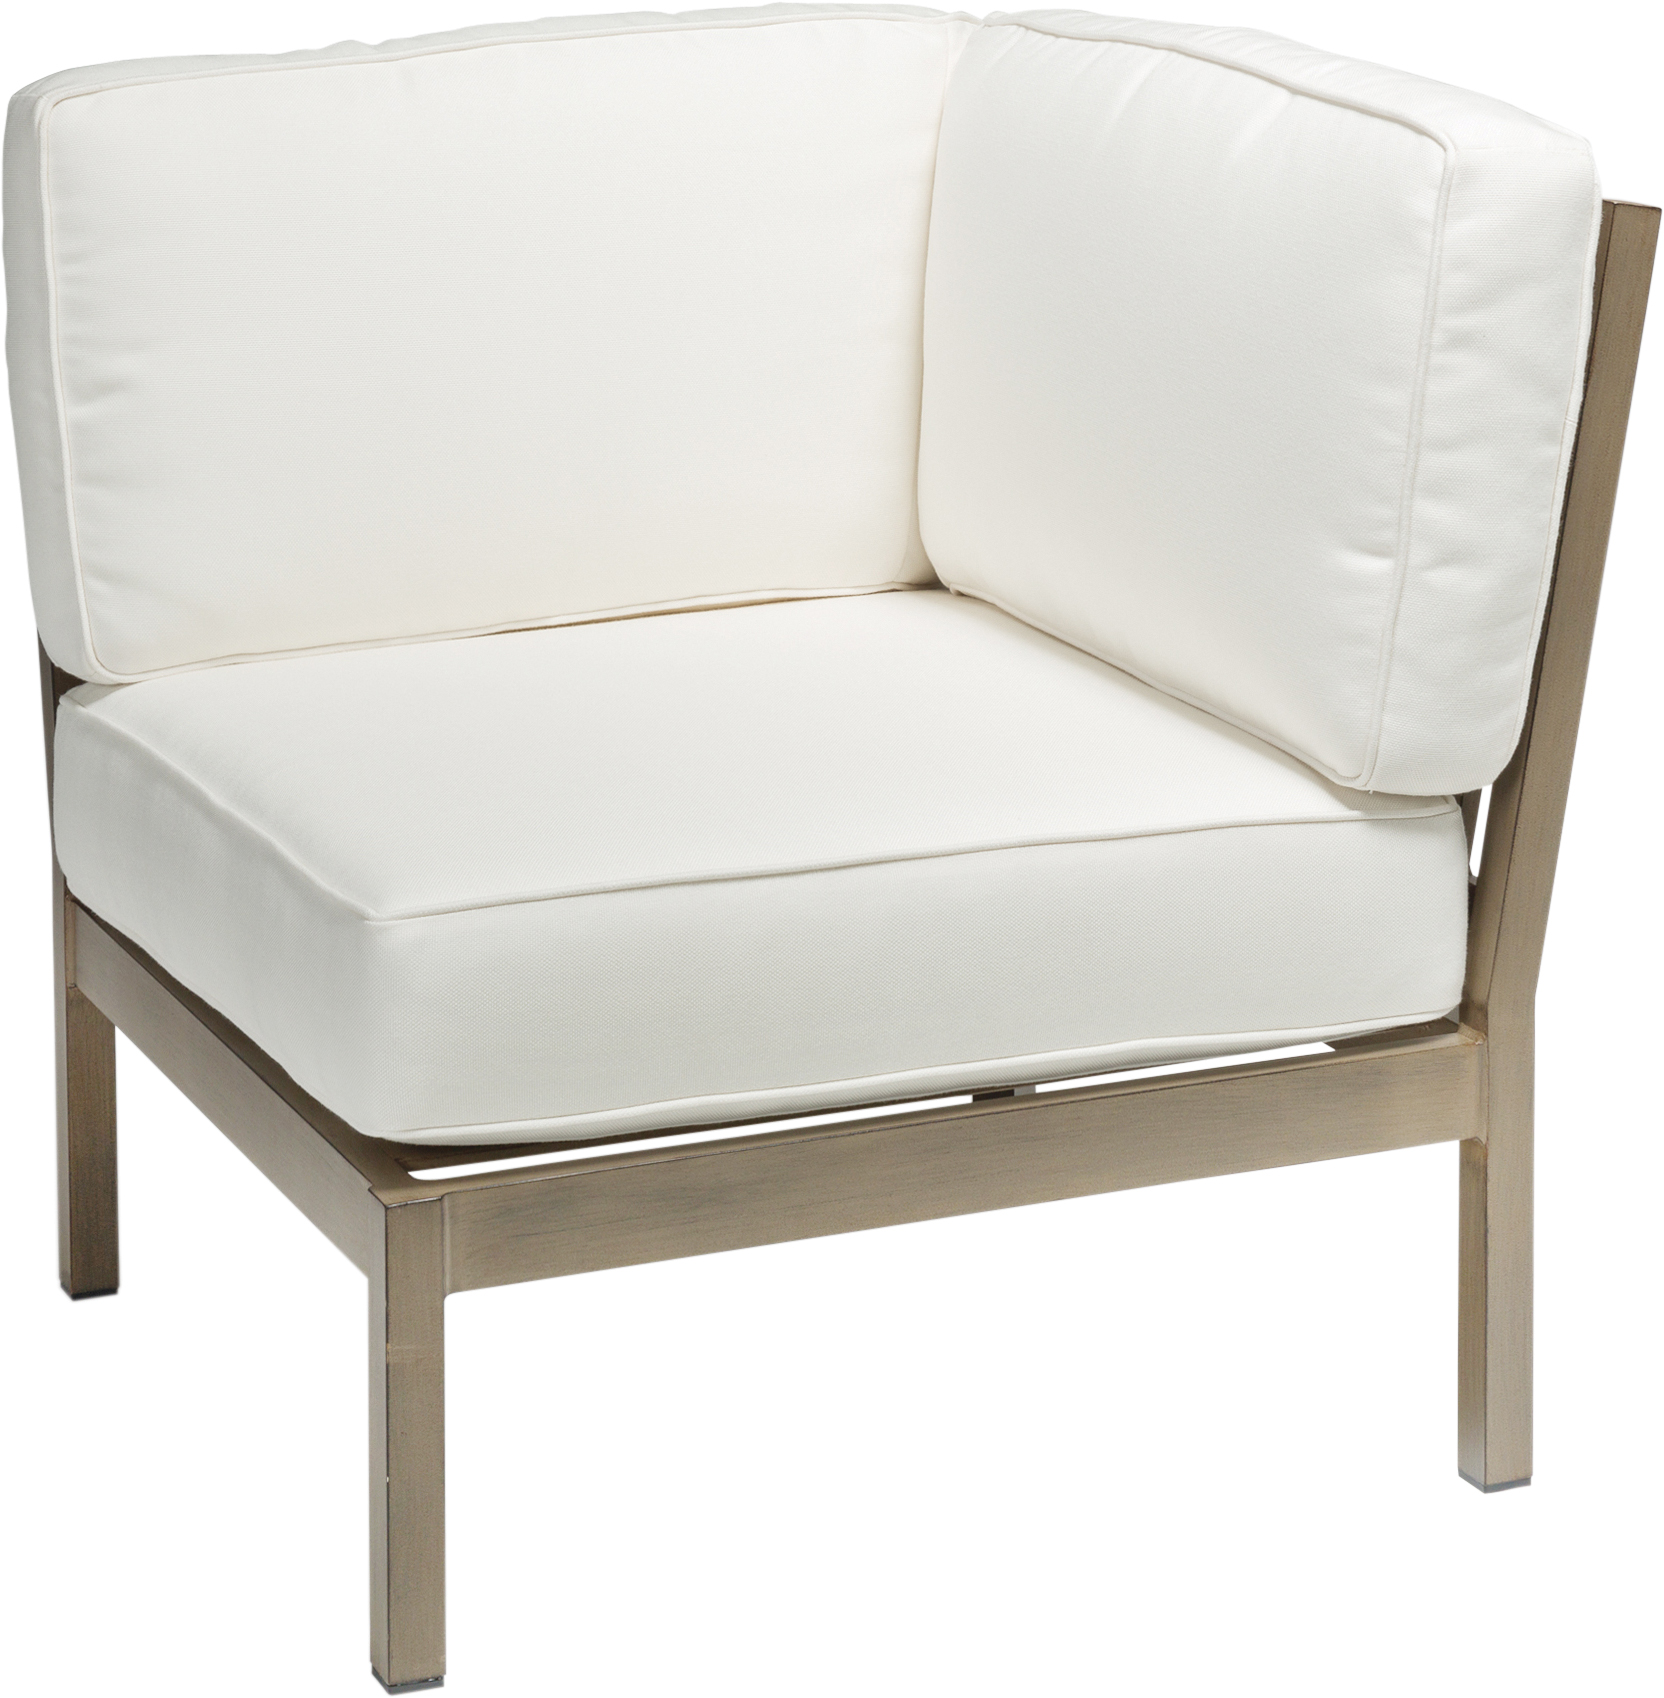 Avalon Sectional Corner Chair